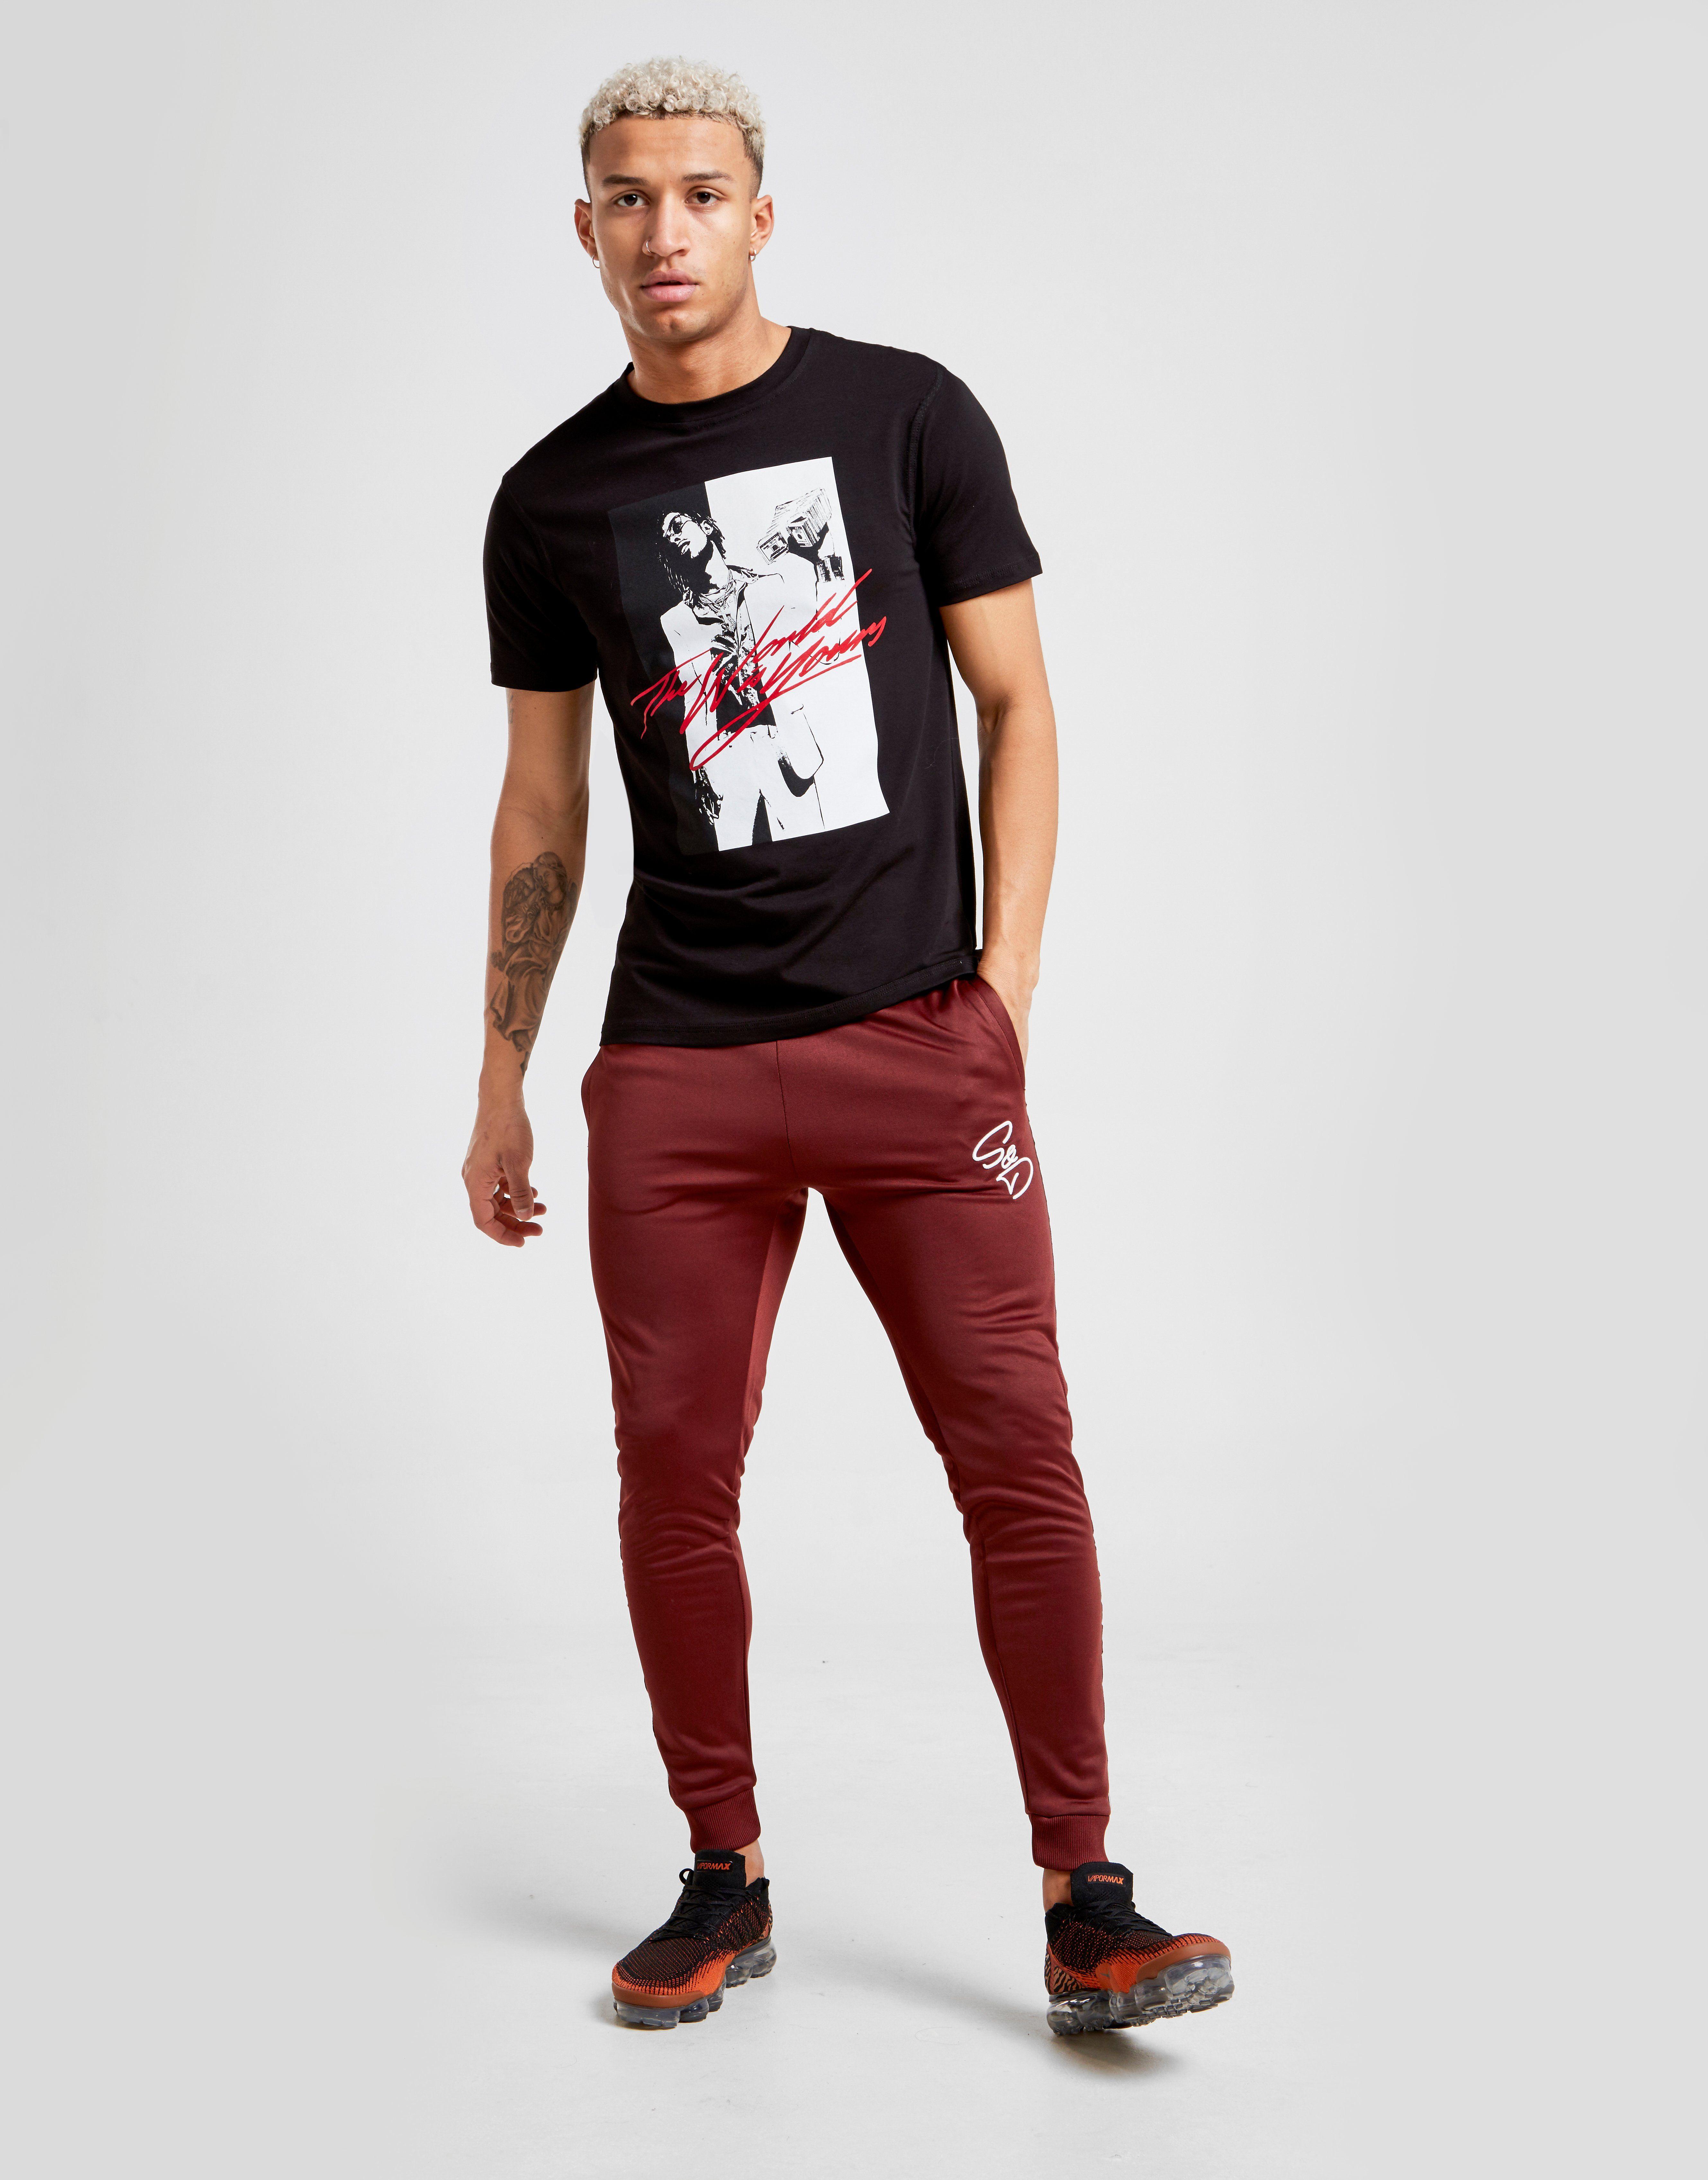 Supply & Demand Rich The Kid 2 T-Shirt